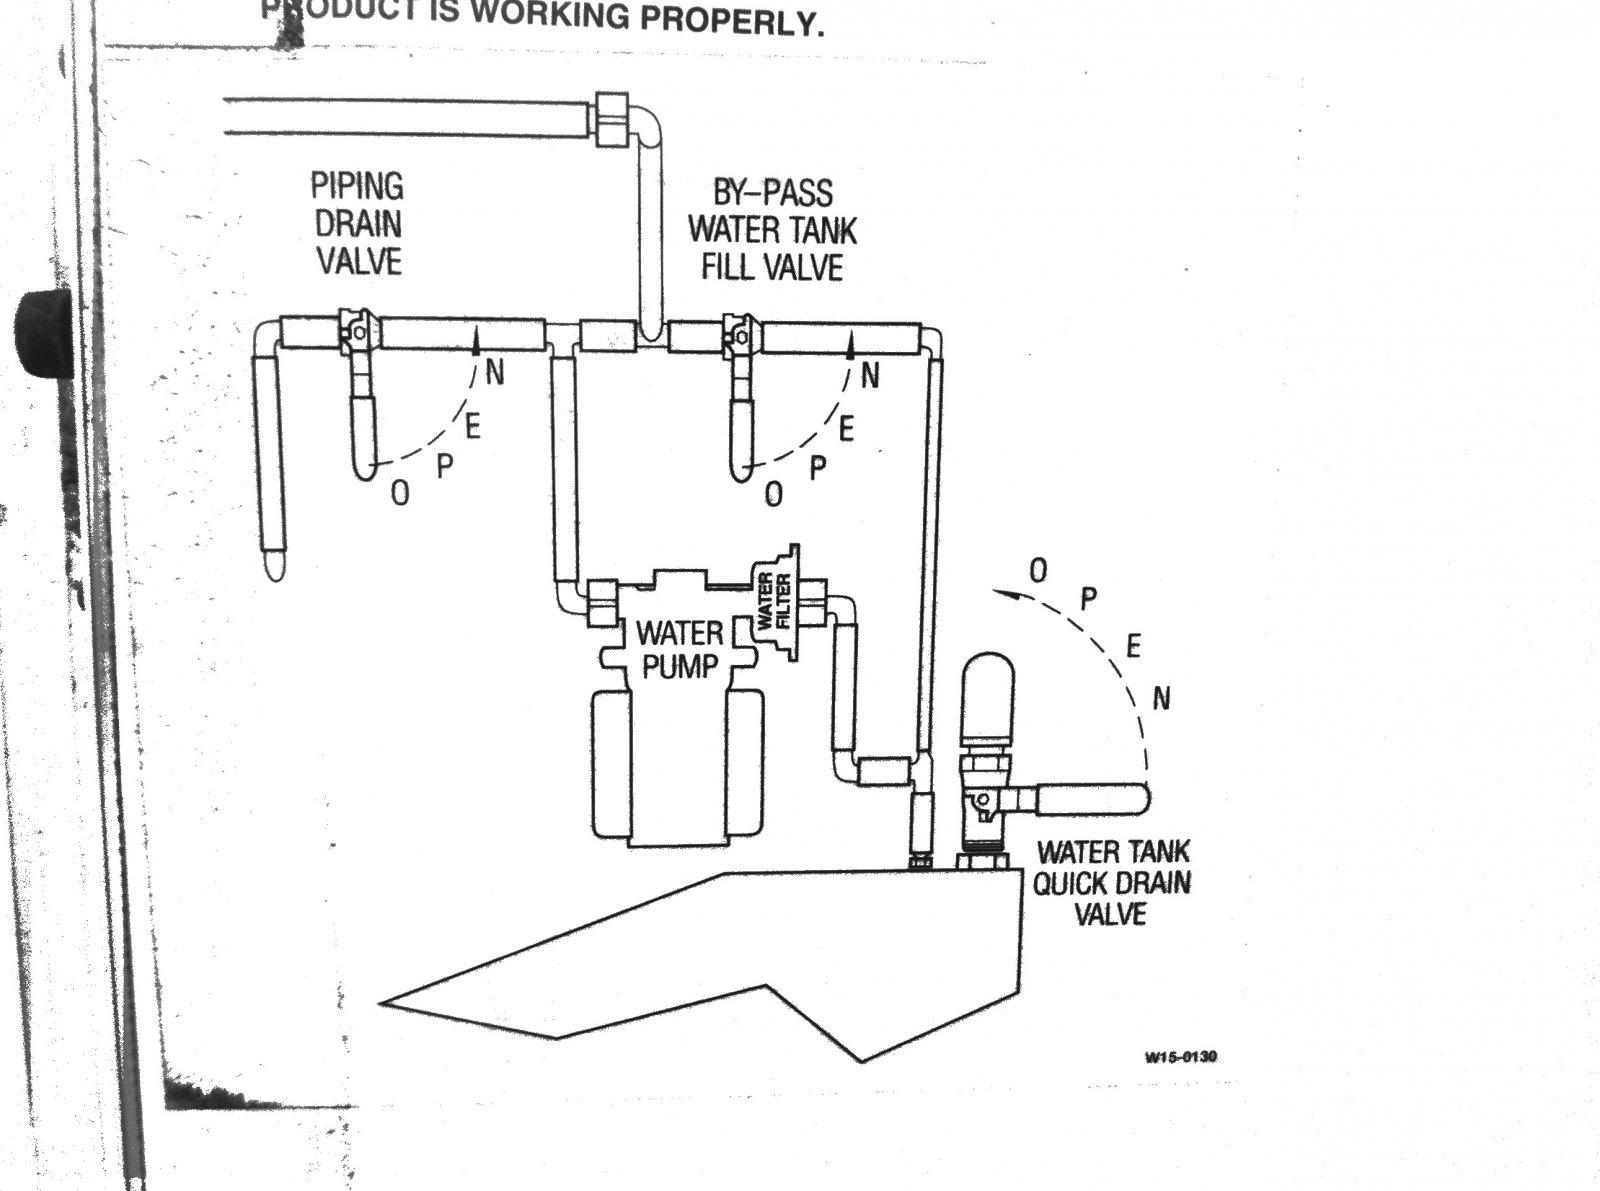 hight resolution of 1990 fleetwood motorhome wiring diagram